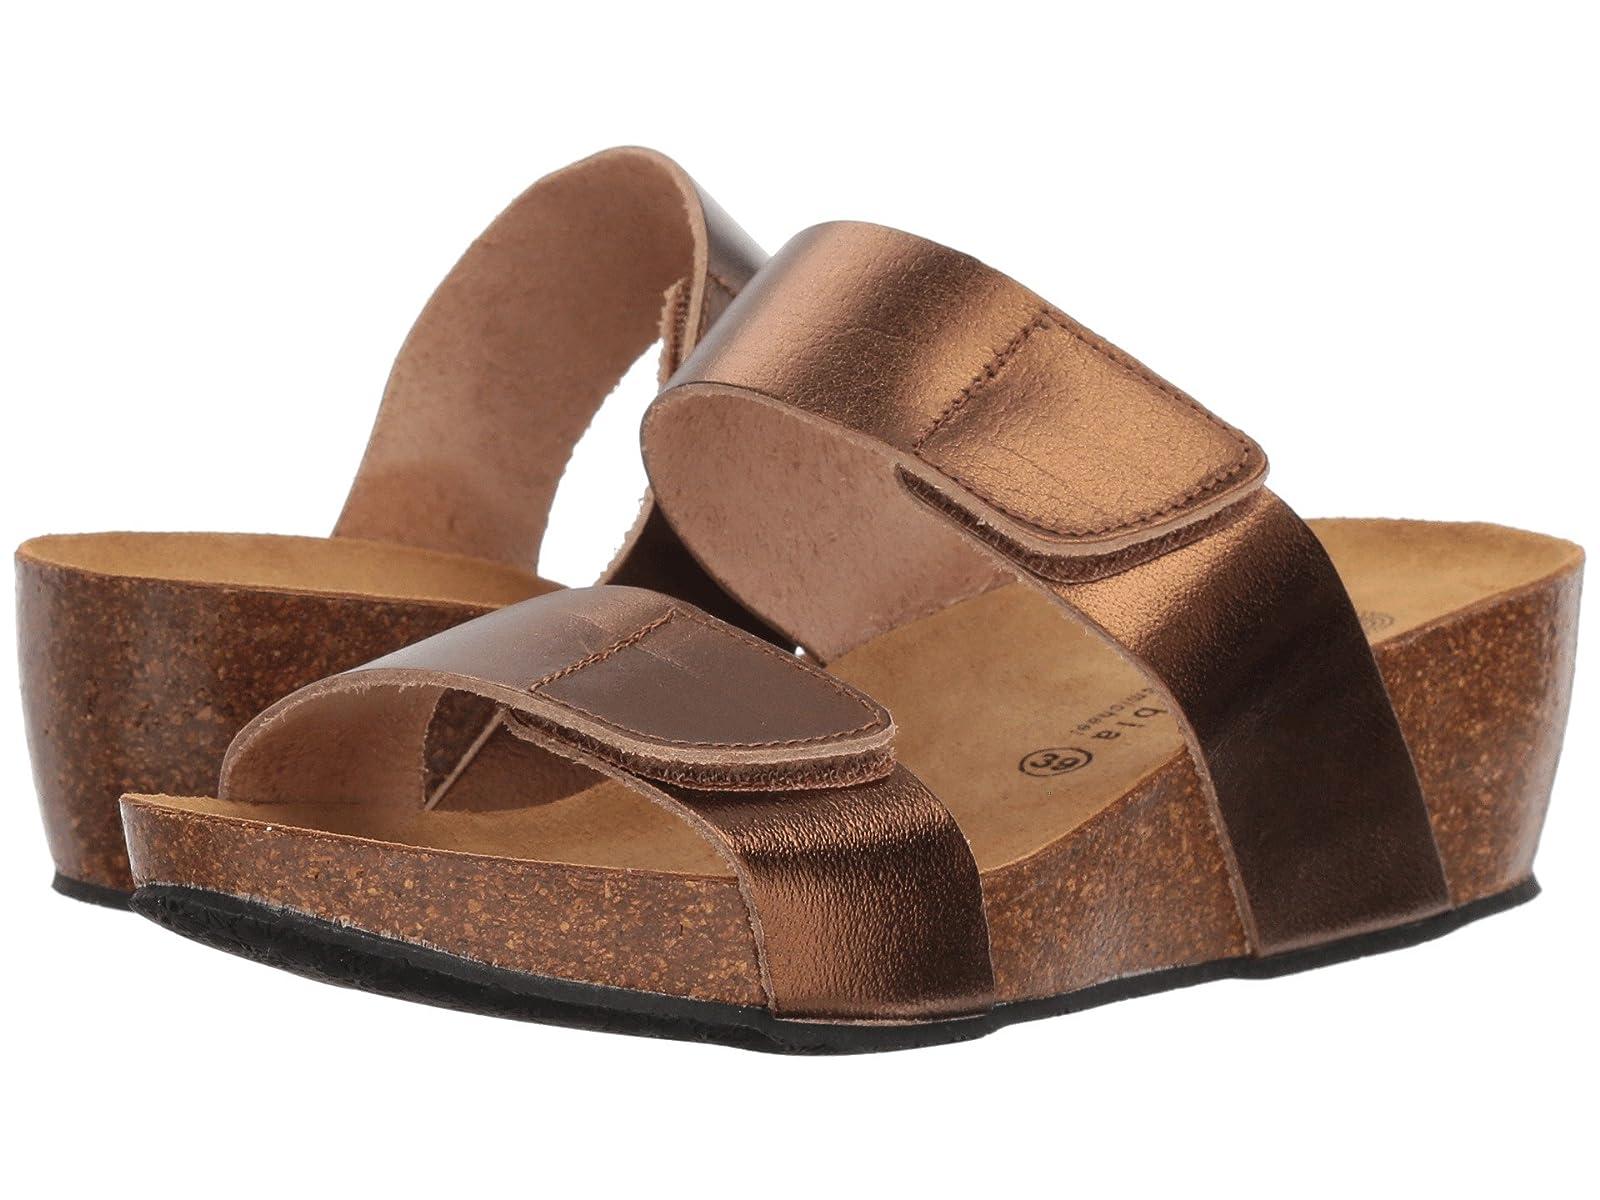 Eric Michael LiatAtmospheric grades have affordable shoes